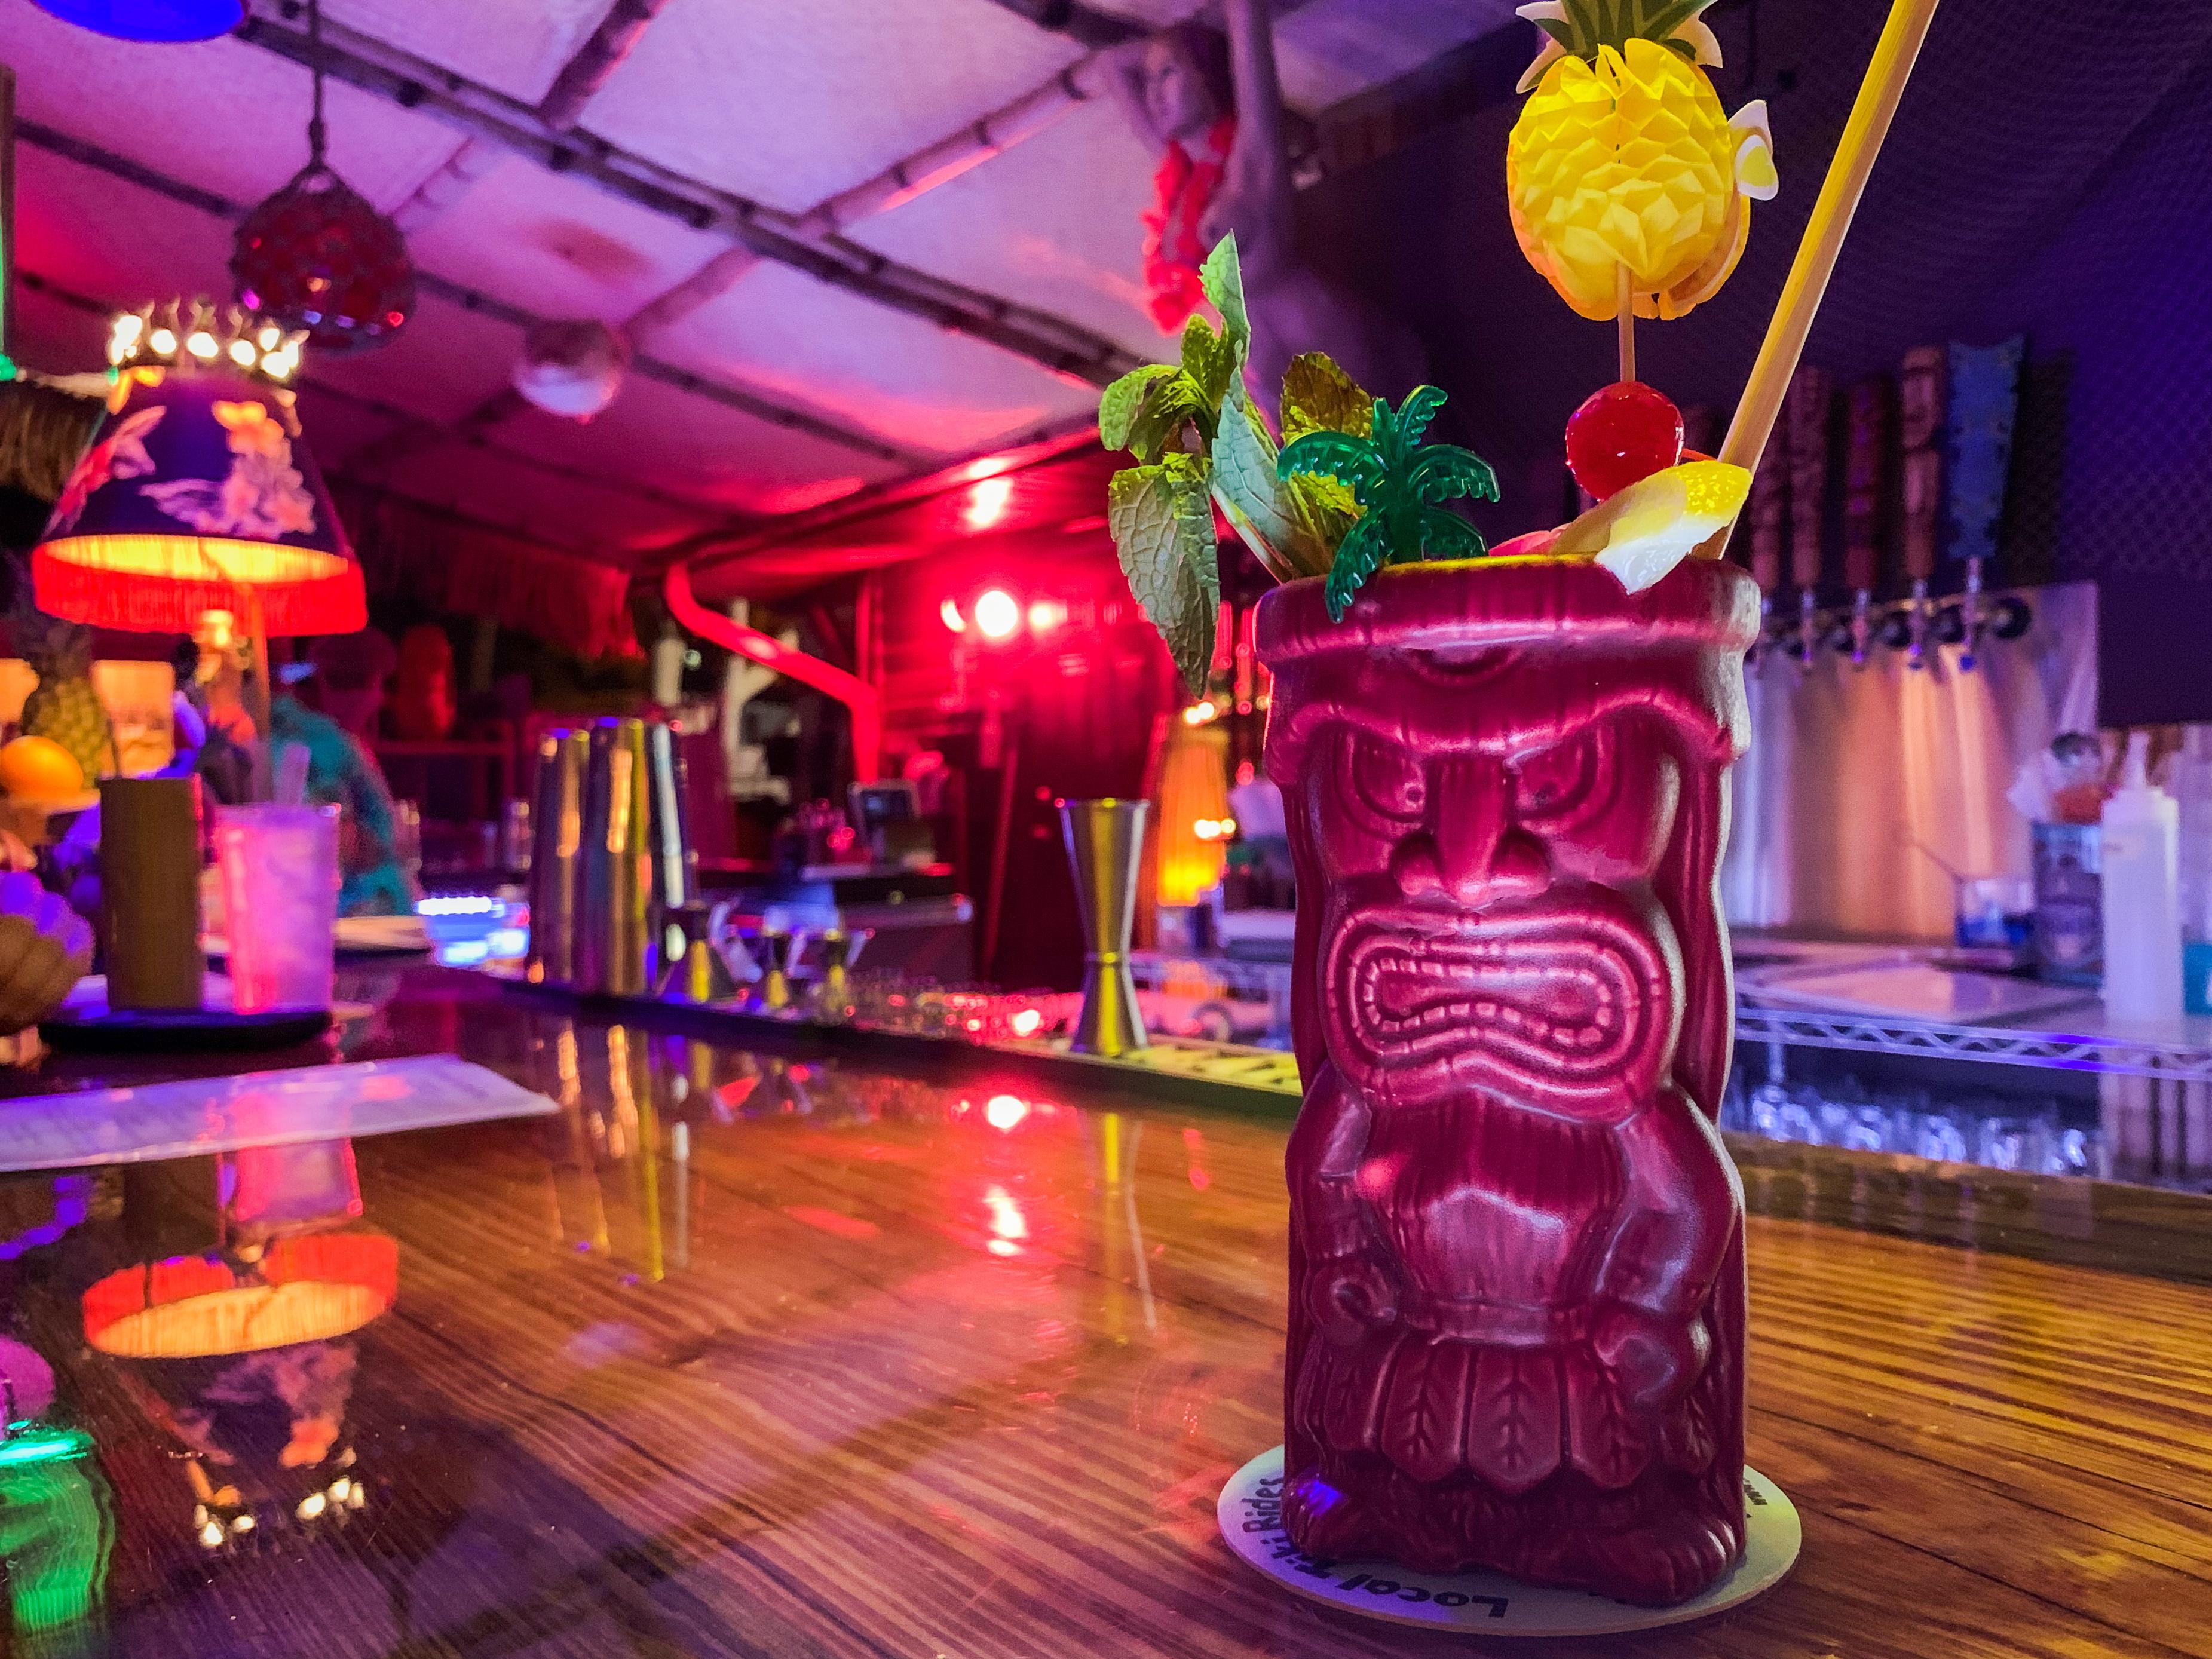 Tampa Bay food events this weekend: Kumquat Festival, Gasparilla grub